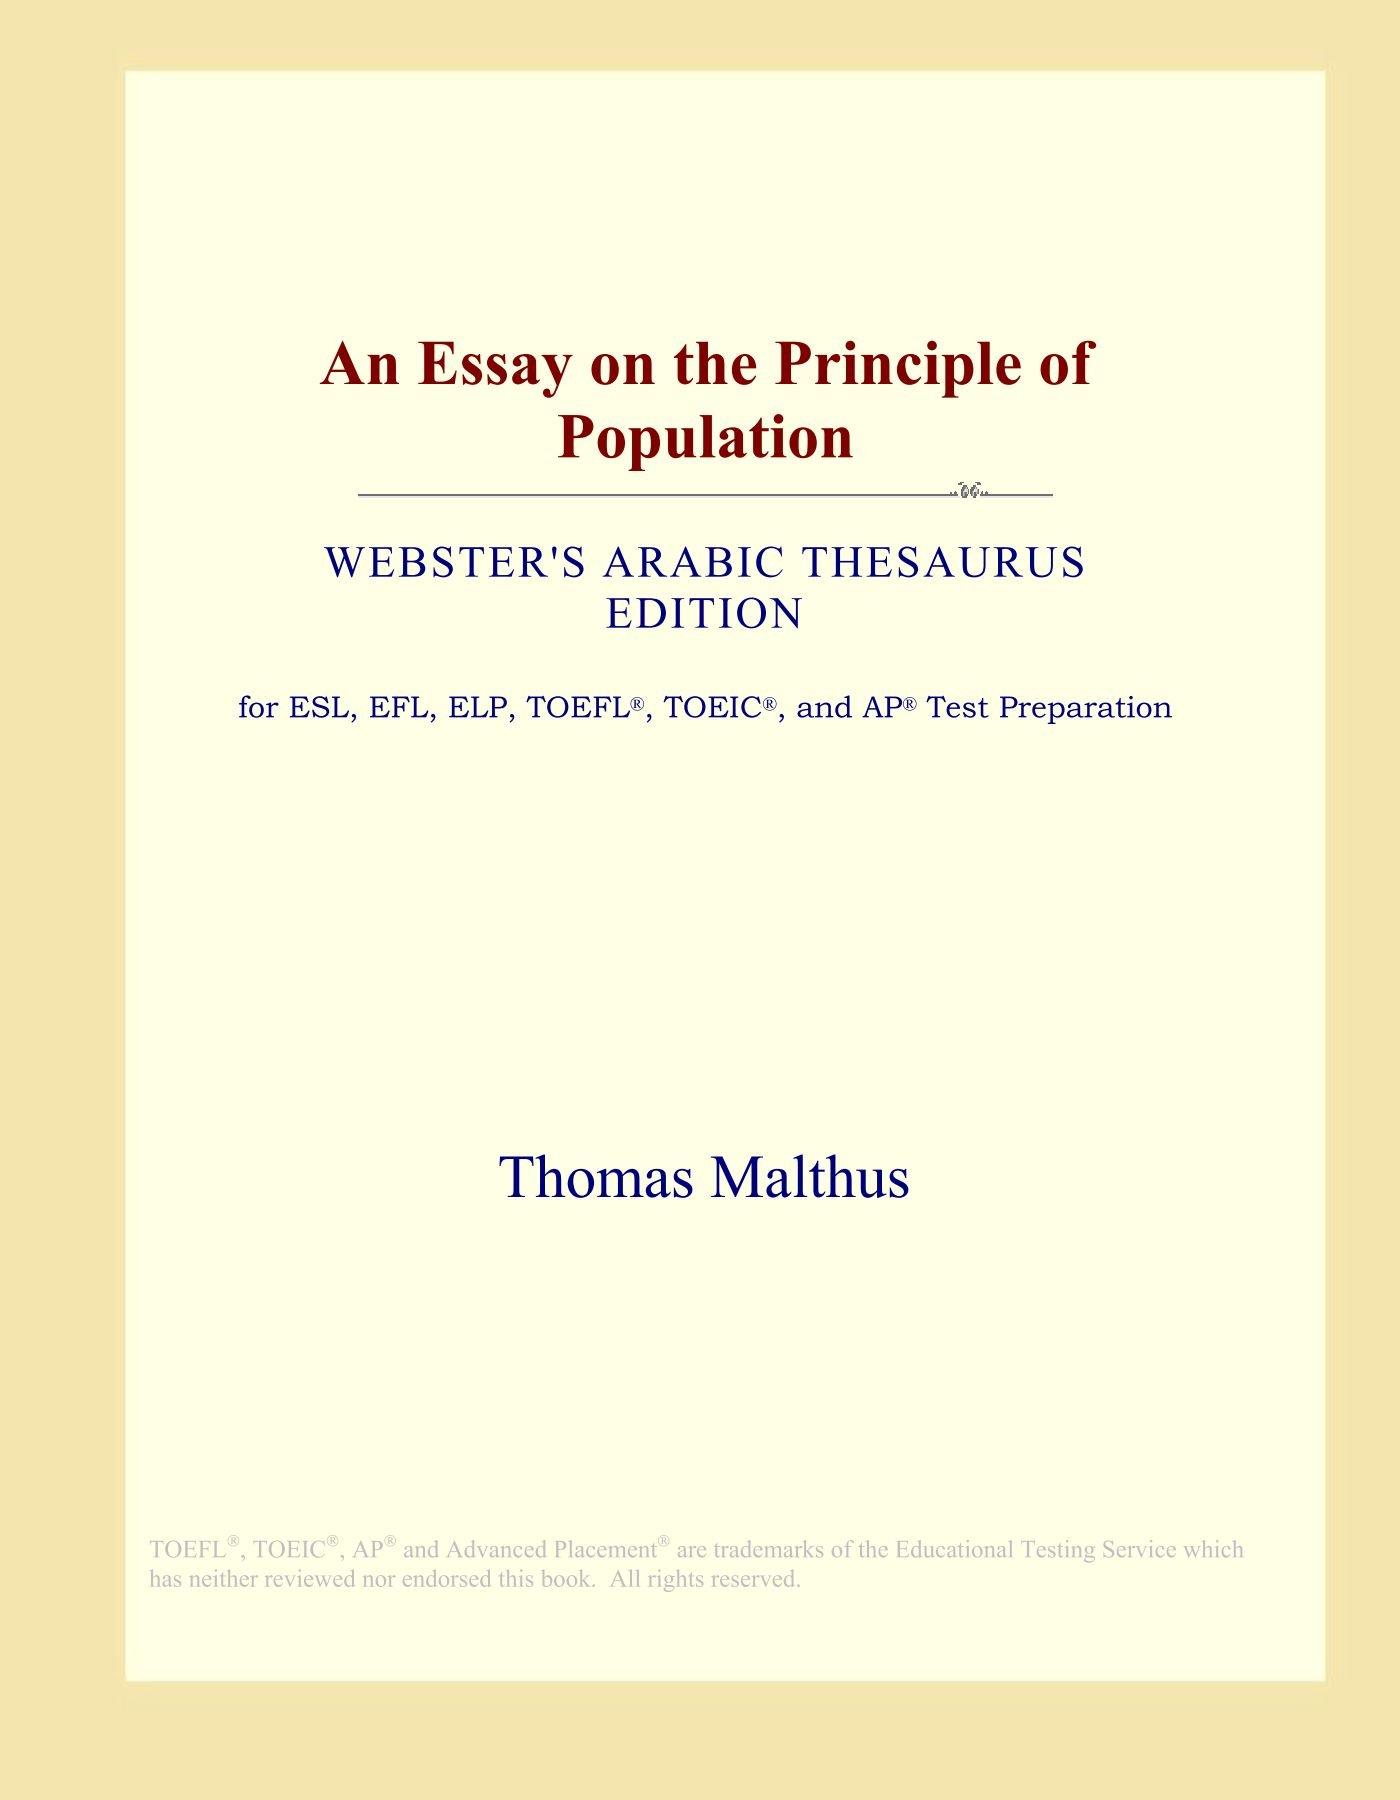 015 61groeunvgl Essay On The Principle Of Population Singular Pdf By Thomas Malthus Main Idea Full